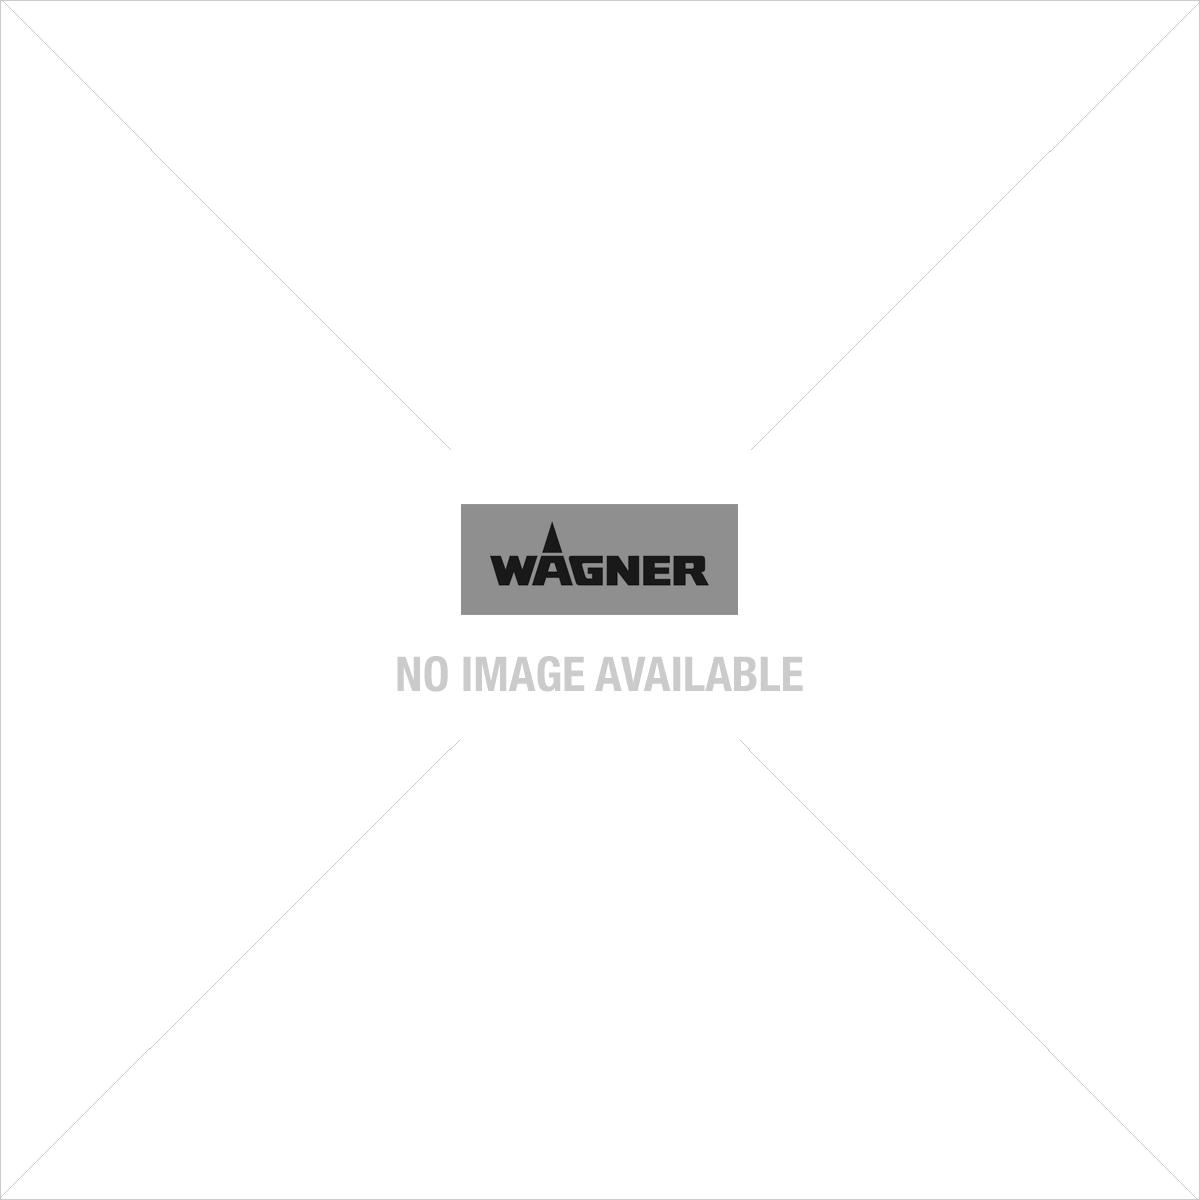 Wagner W450 SE pistolet peinture Airless